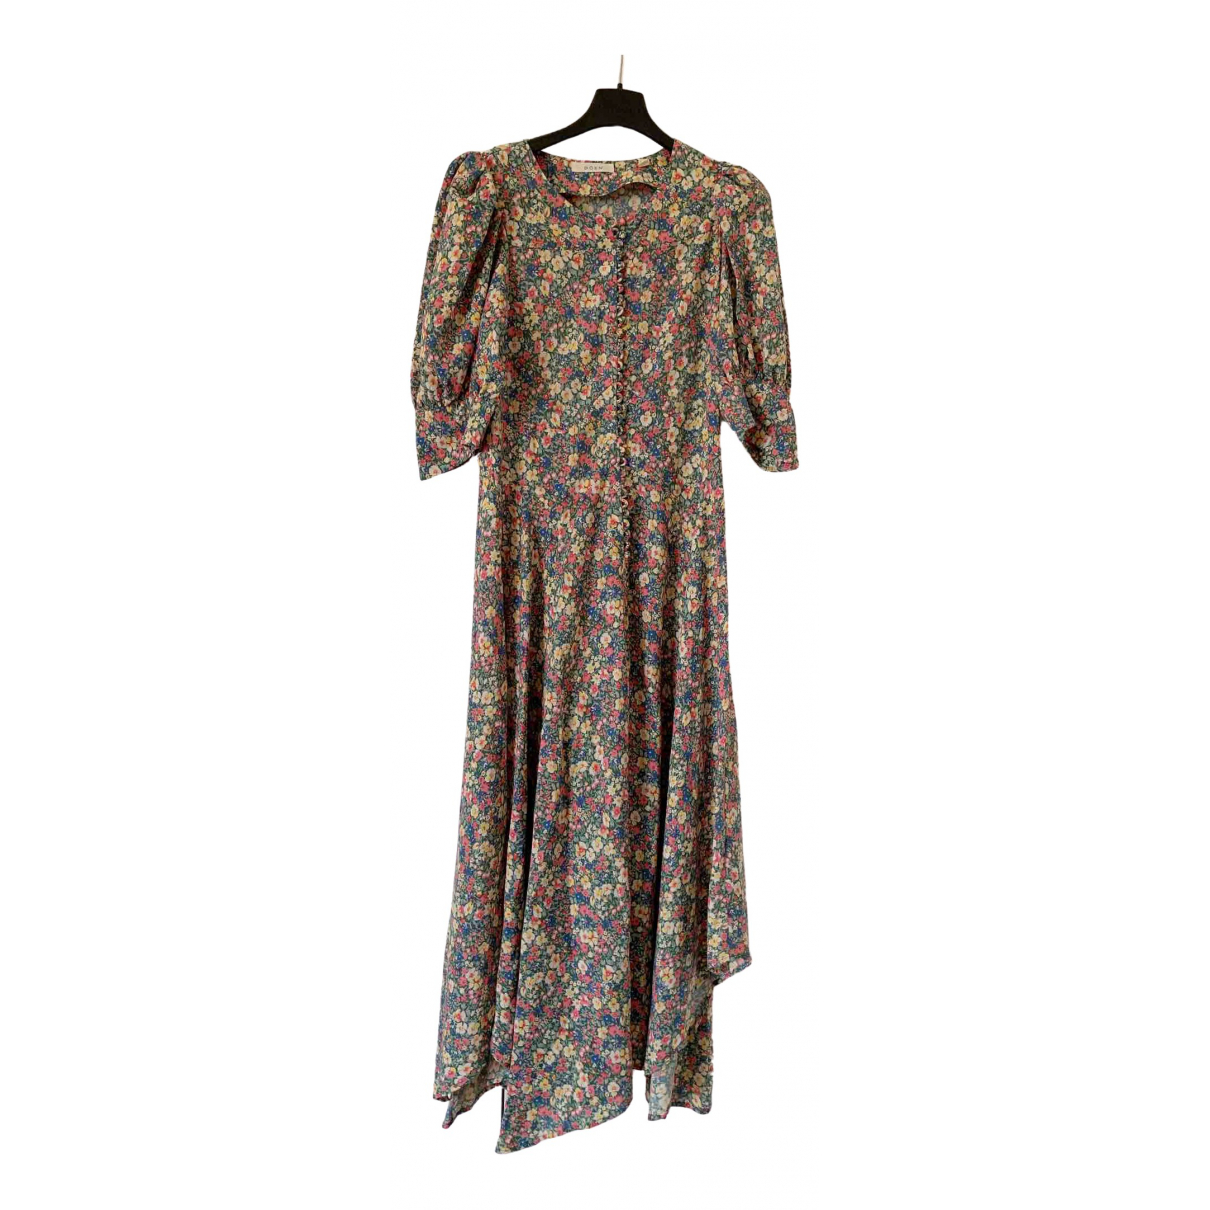 Dôen \N Multicolour Silk dress for Women S International